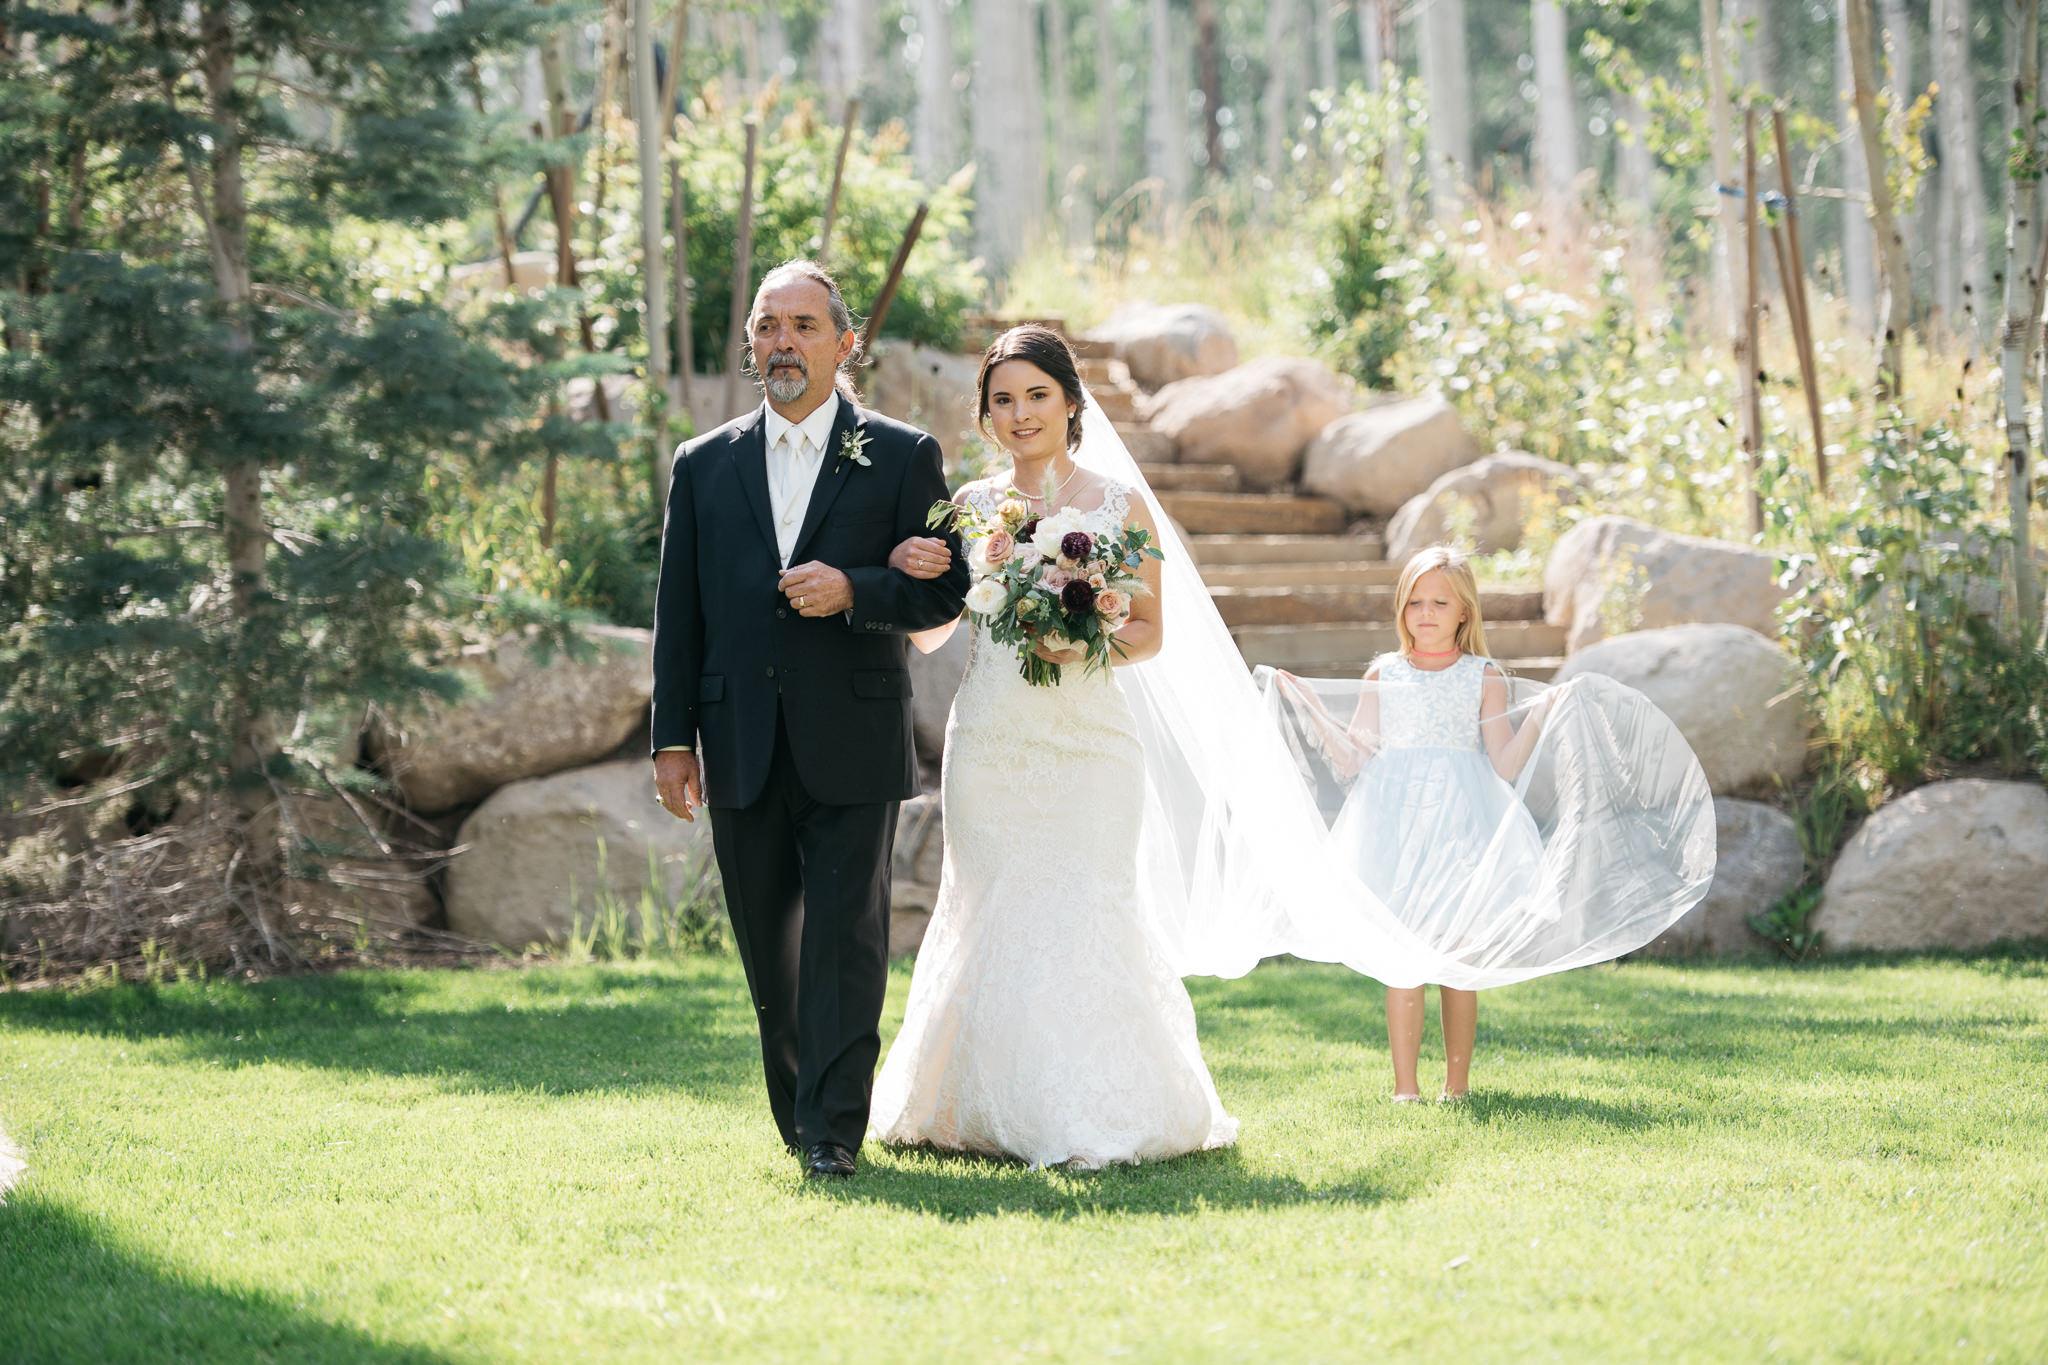 249_ONL_Kat_Nick_Wedding_Trevor_Hooper_Photo.jpg